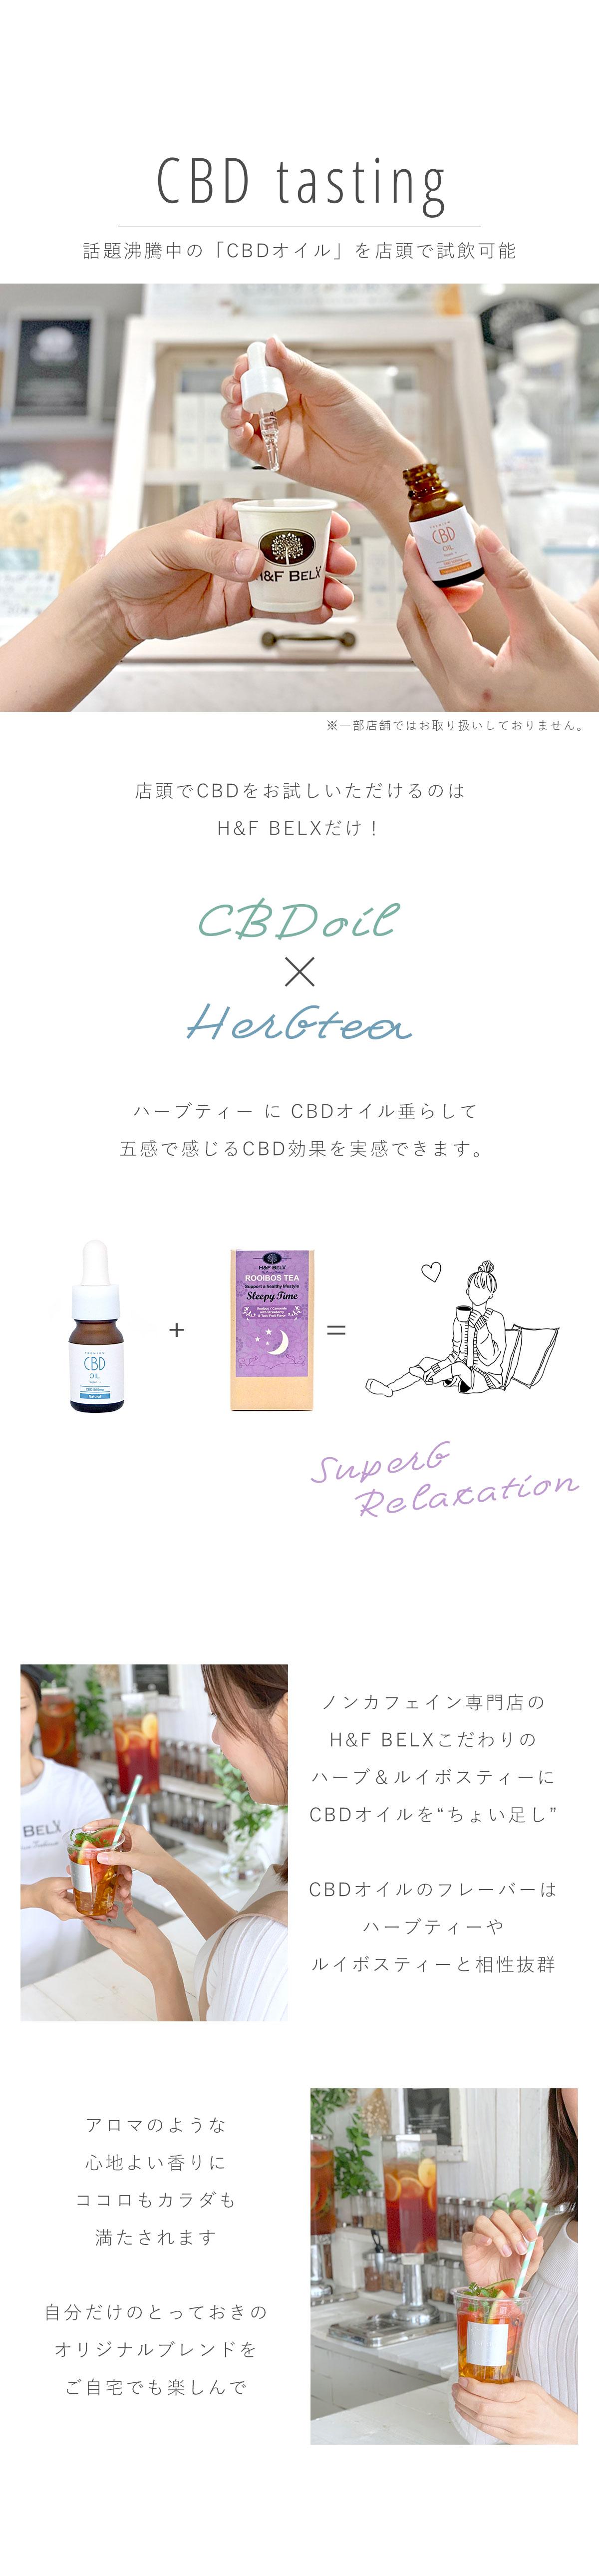 CBDオイル 高濃度 カンナビジオール ヘンプ テルペン MCTオイル